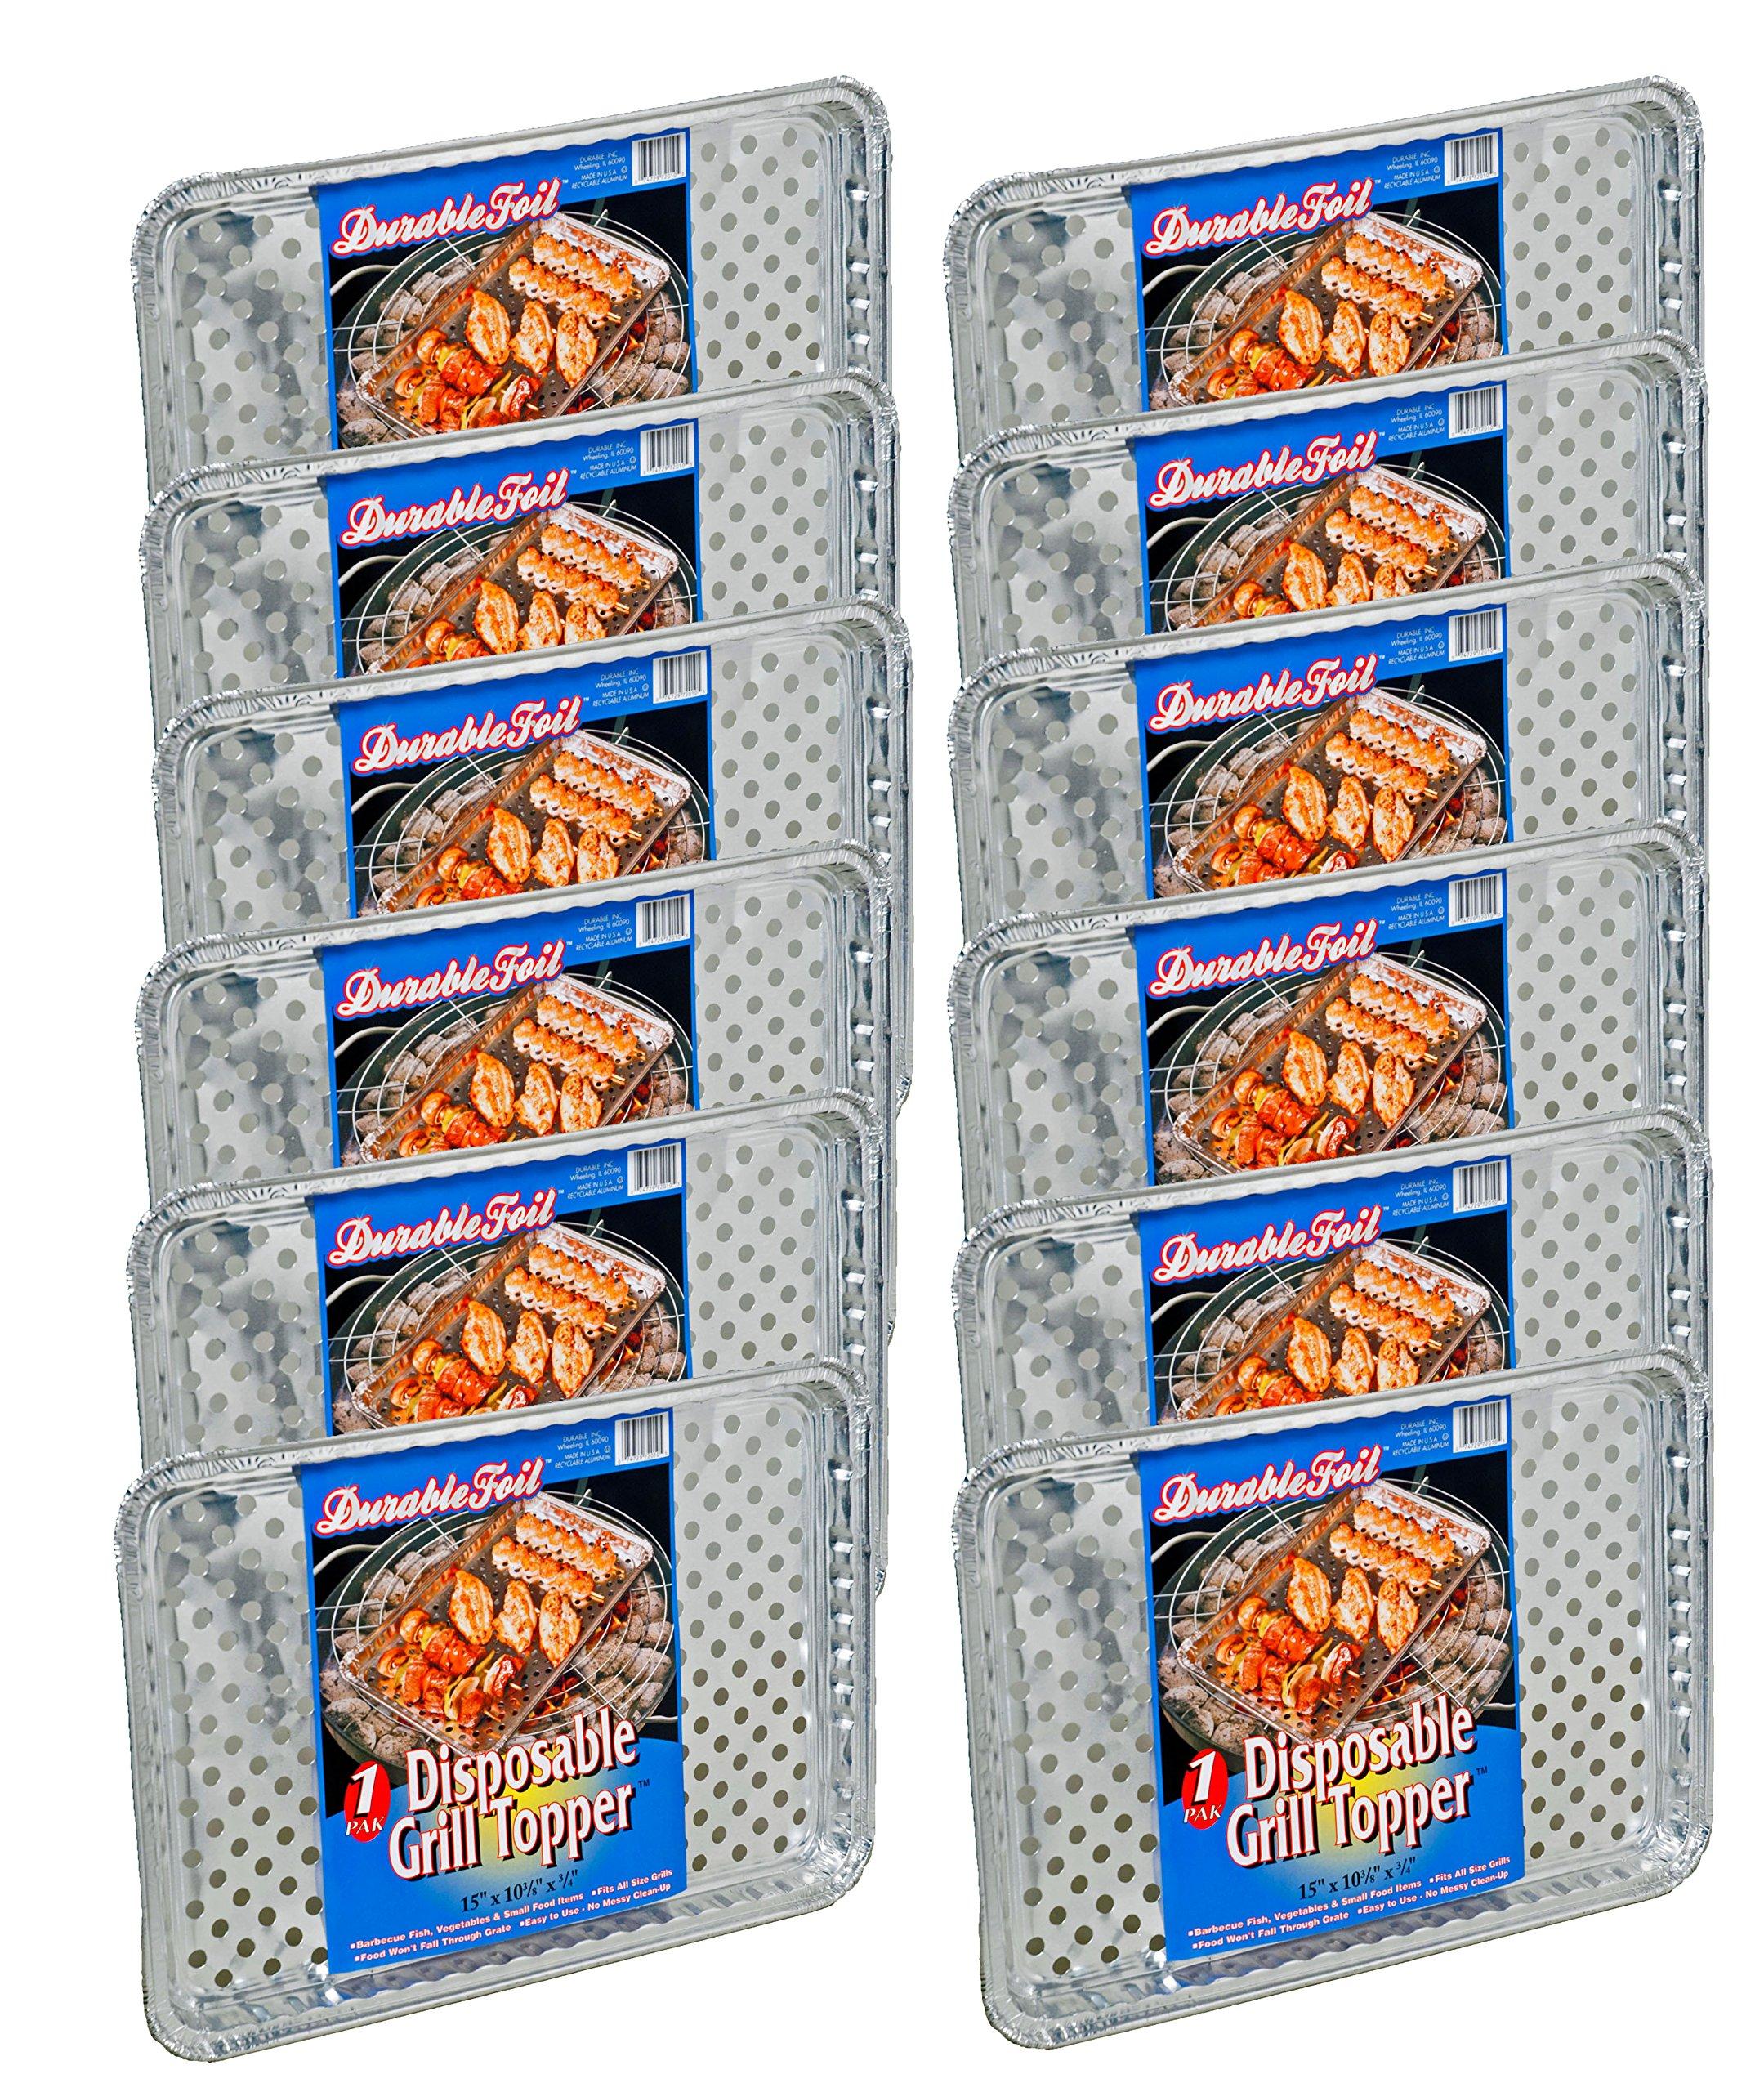 Set of 12 Durable Foil Disposable Deep Grill Topper Pans 11 3/4'' L x 9 1/4'' W x 1 1/2'' D by Durable (Image #1)